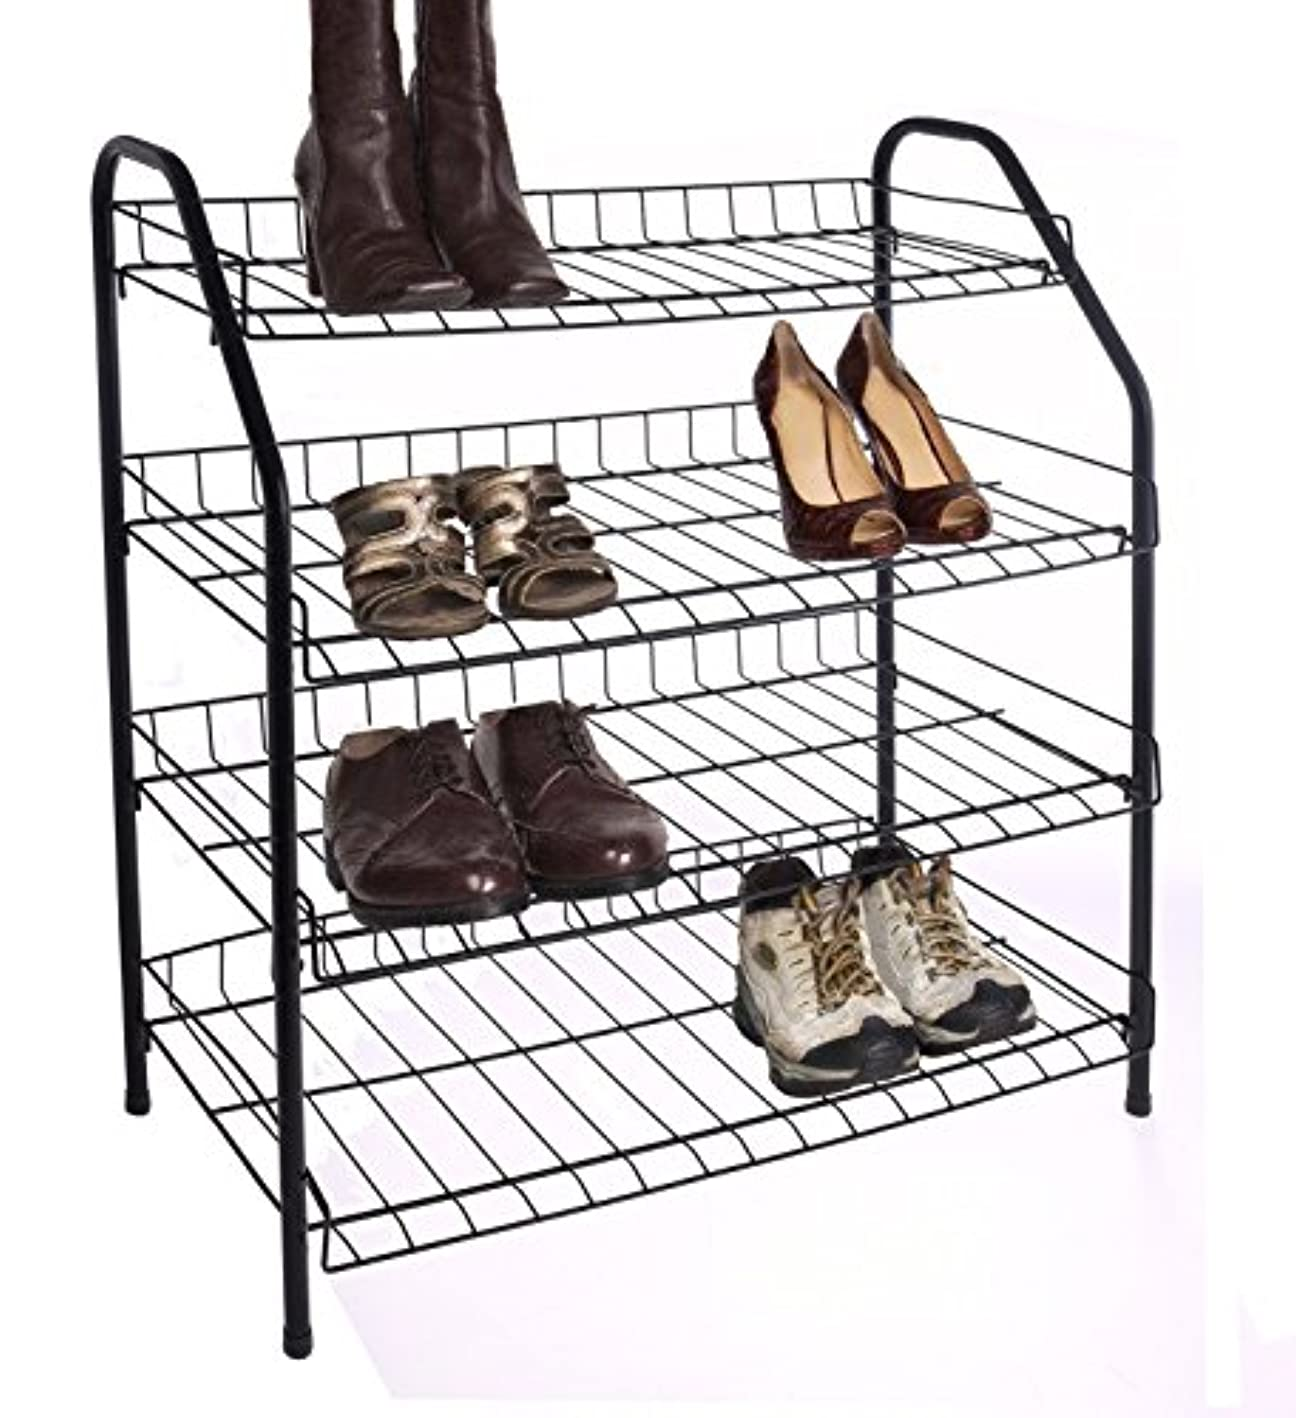 American Dream Home Goods Organizer 210-BK Shoe Rack Black